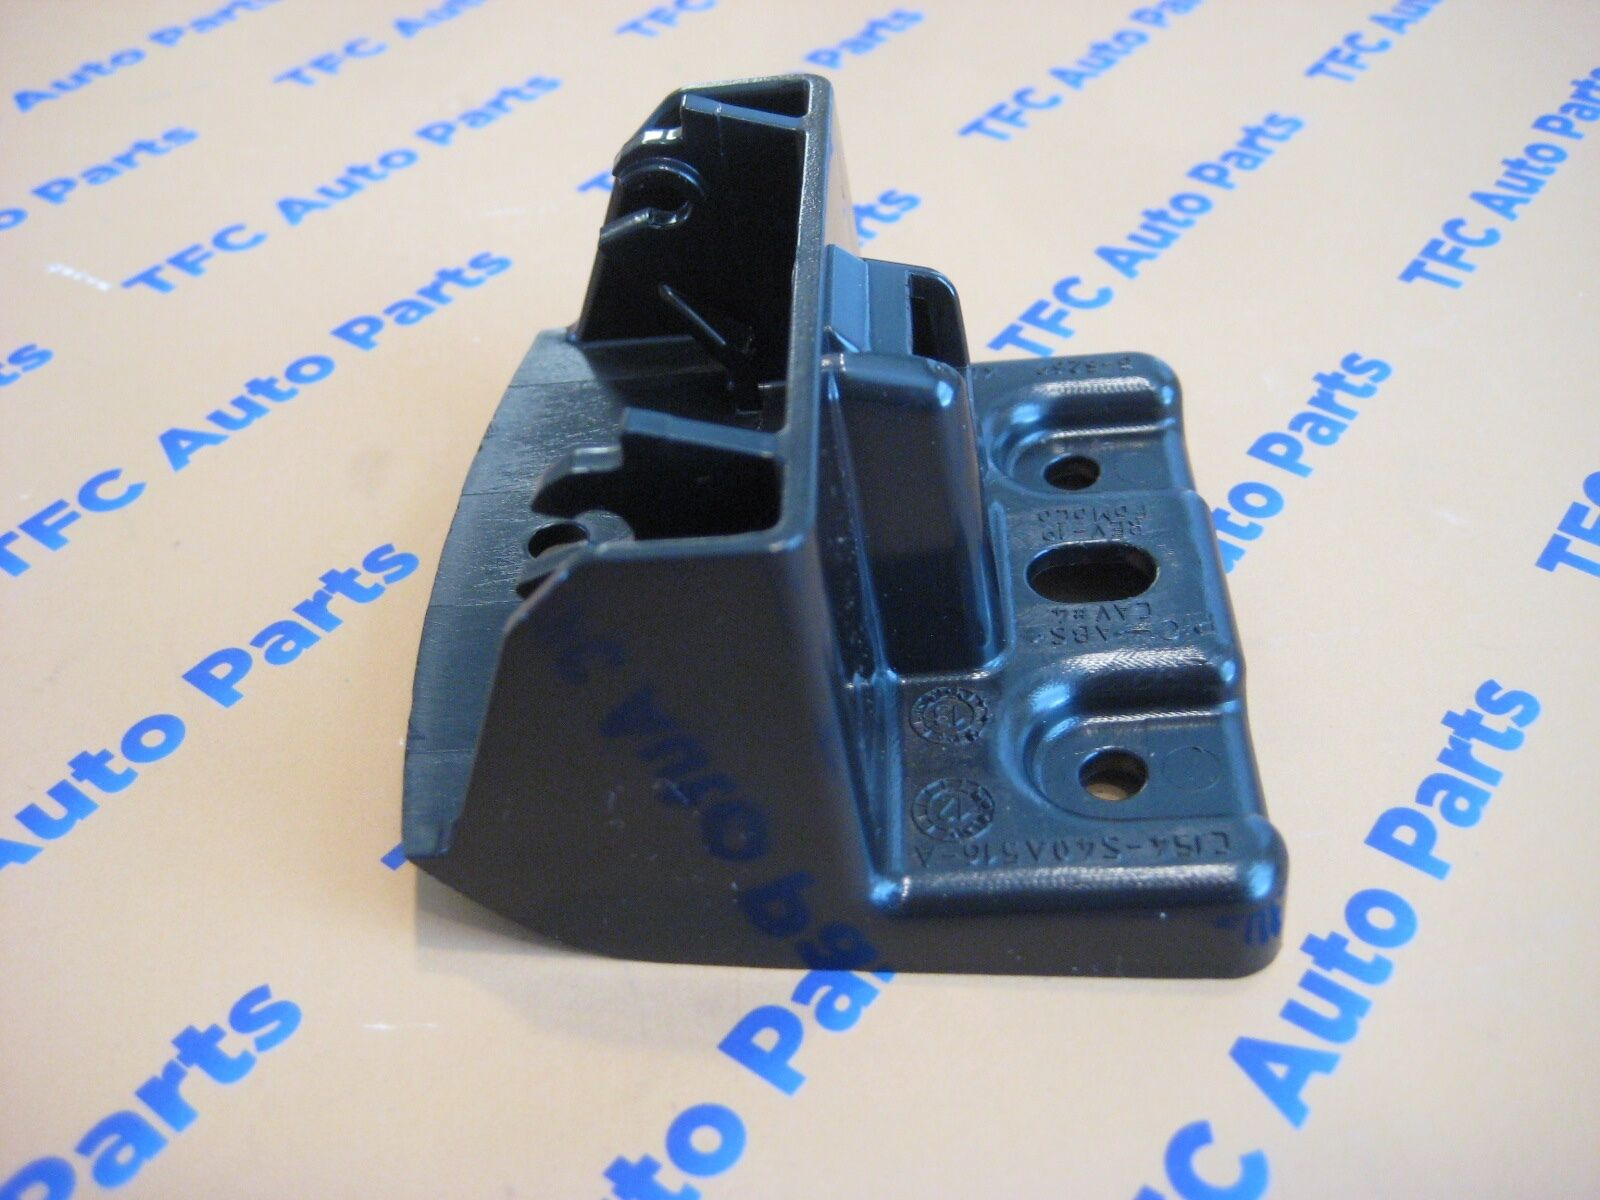 Ford Escape C Max Floor Center Console Latch OEM New Genuine Part 2013-2015